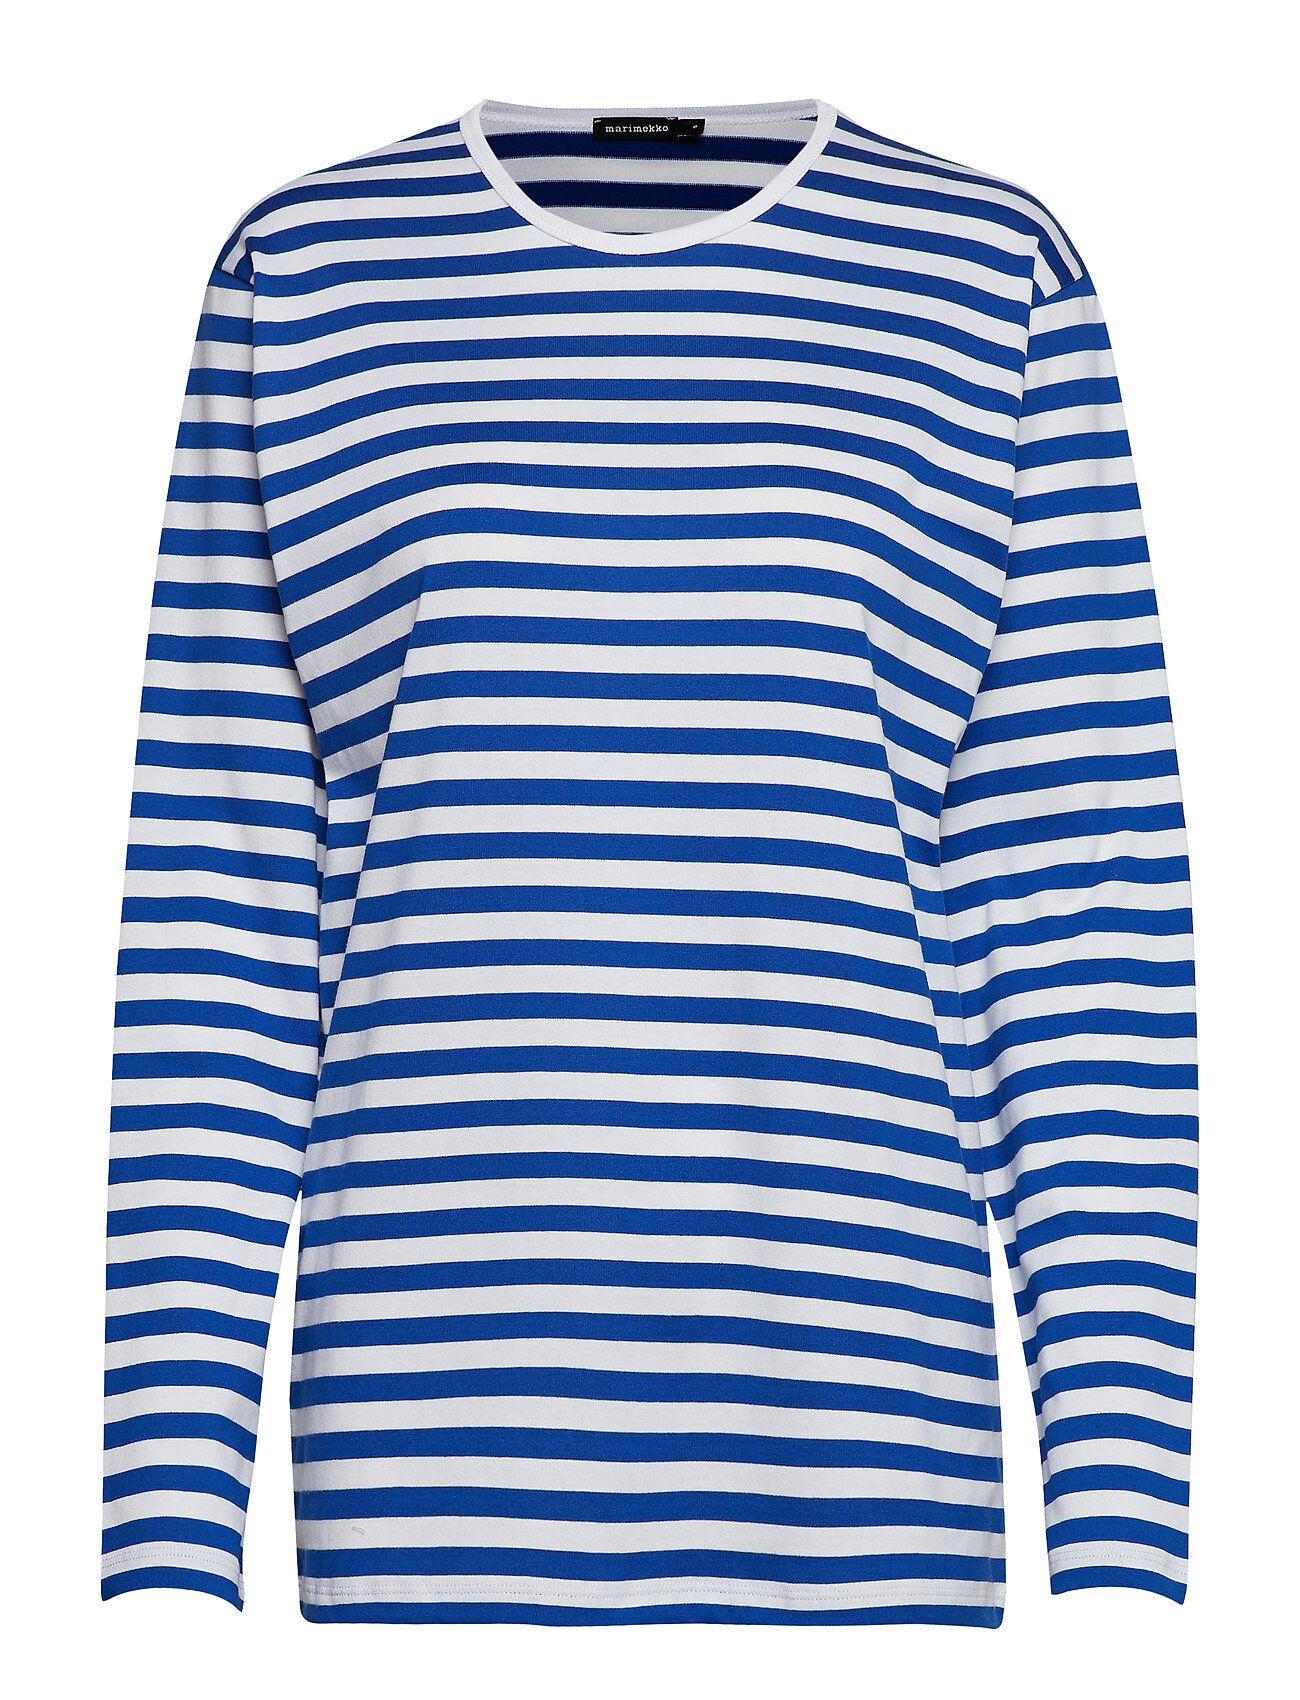 Marimekko PitkÄHiha 2017 Shirt T-shirts & Tops Long-sleeved Sininen Marimekko